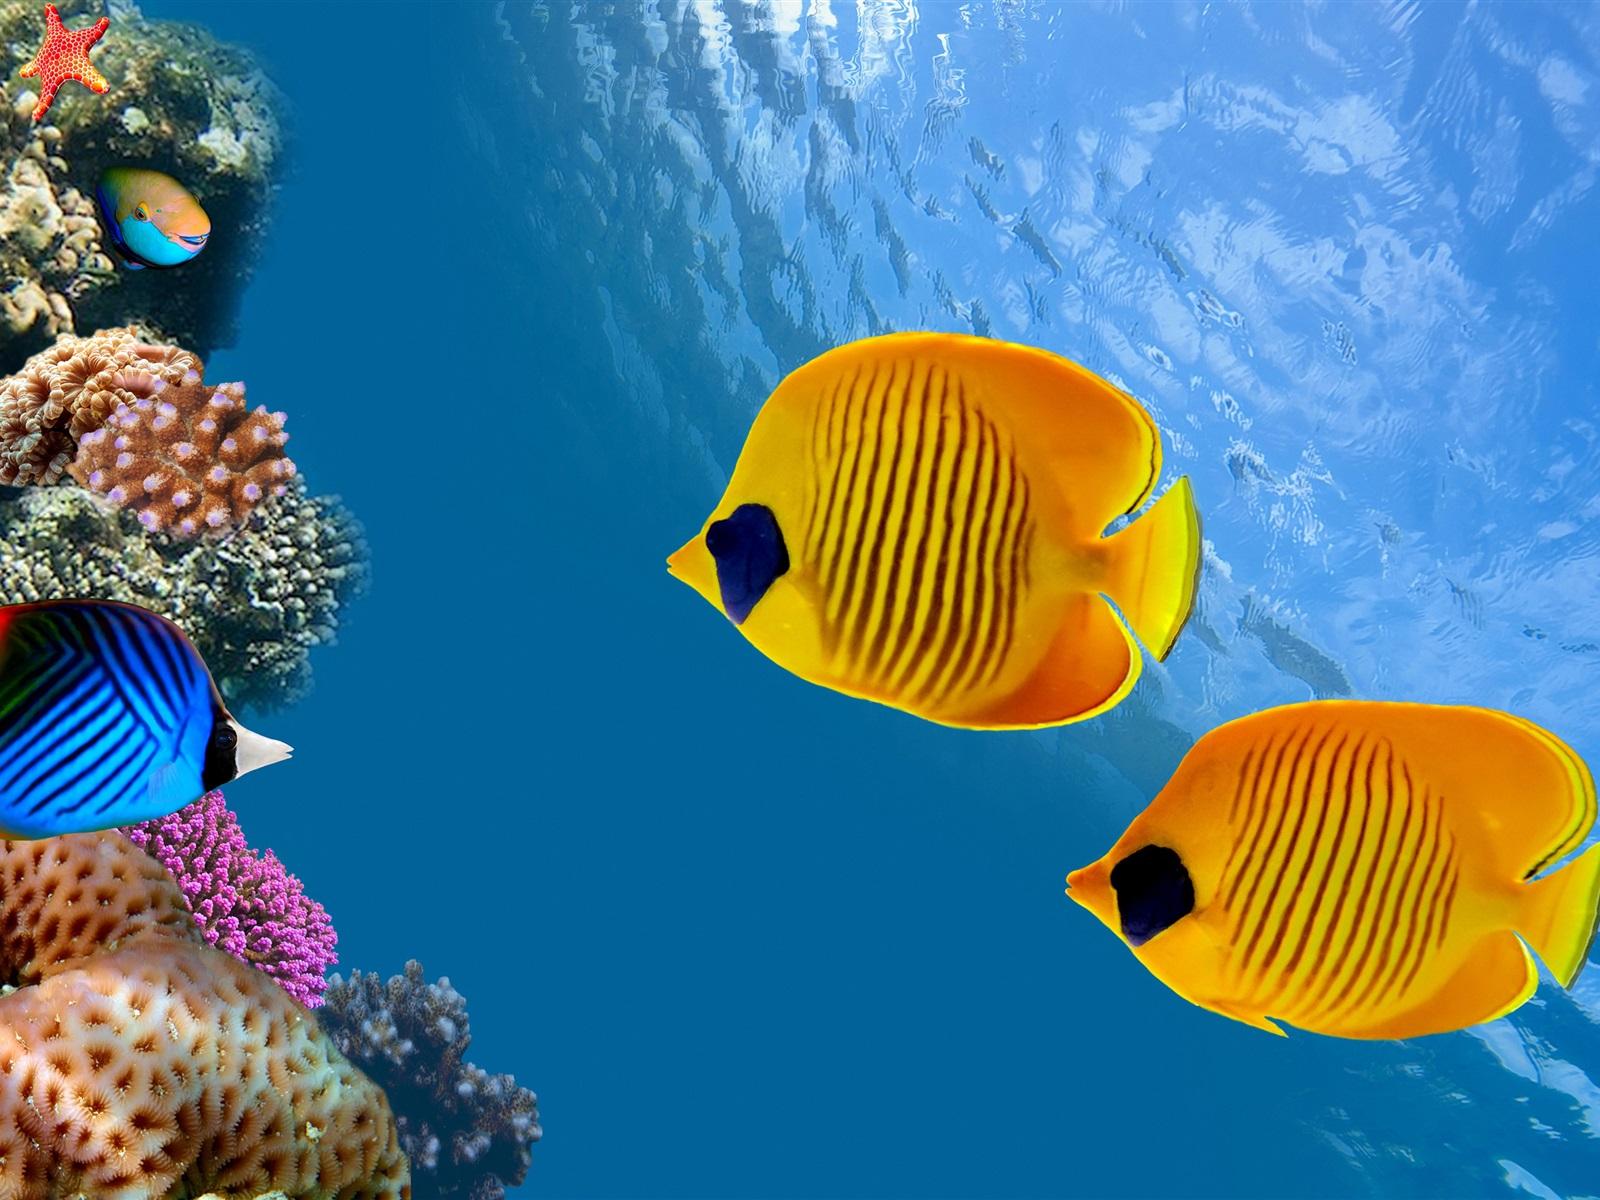 Hd Tropical Island Beach Paradise Wallpapers And Backgrounds: Tropische Fische, Clownfische , Cocos Island, Costa Rica